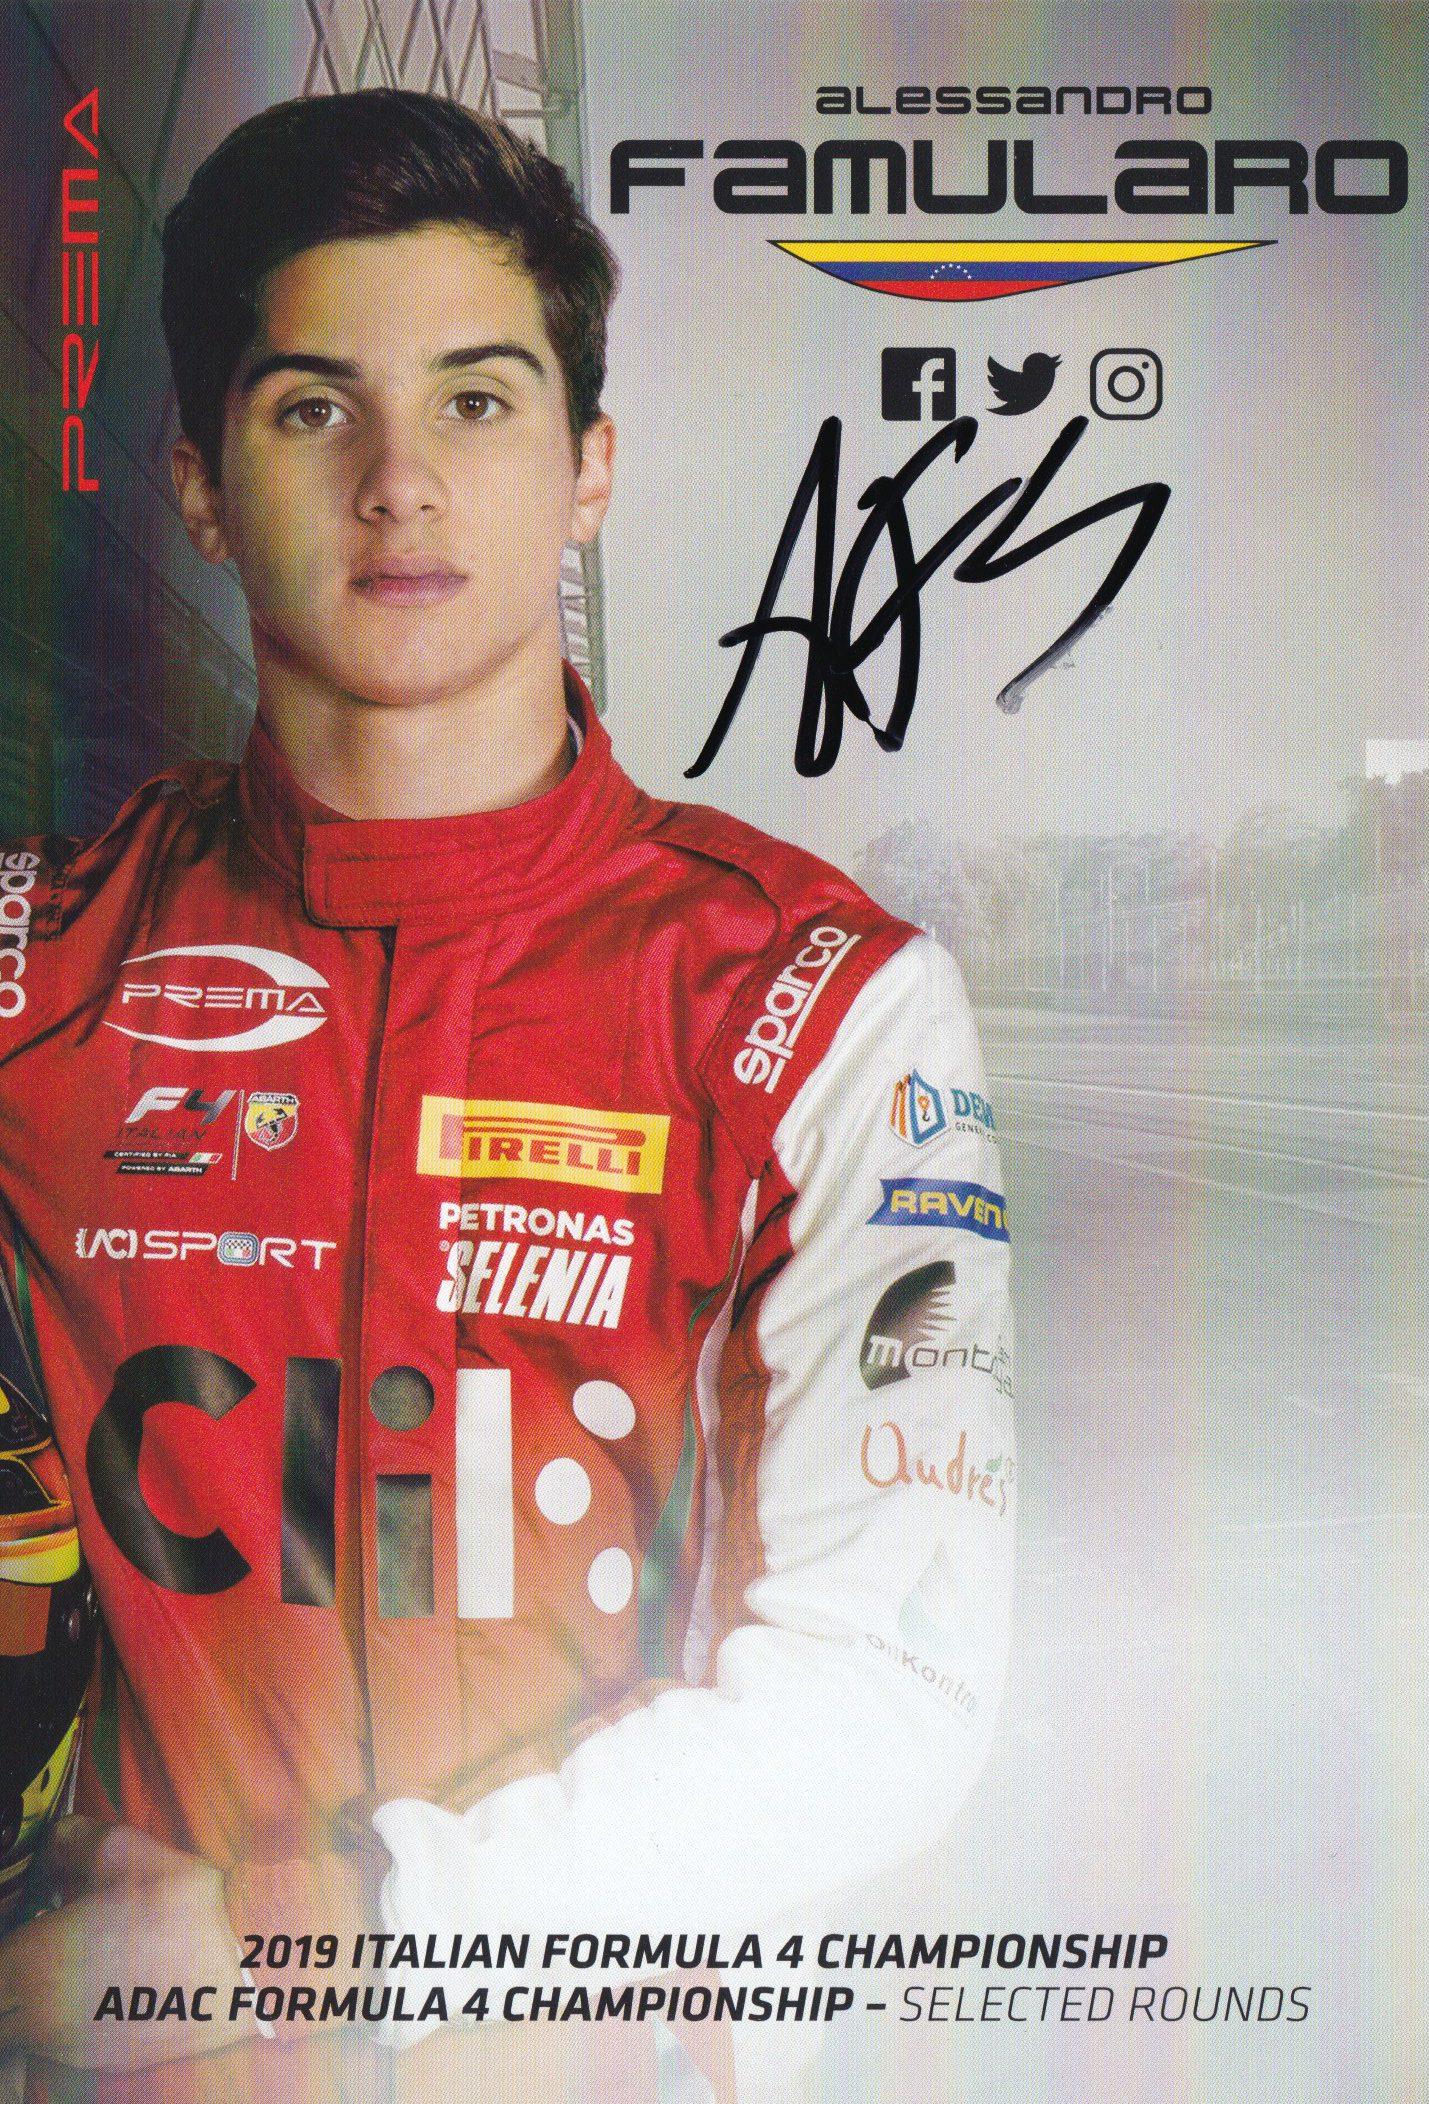 Alessandro Famularo Prema Powerteam 2019